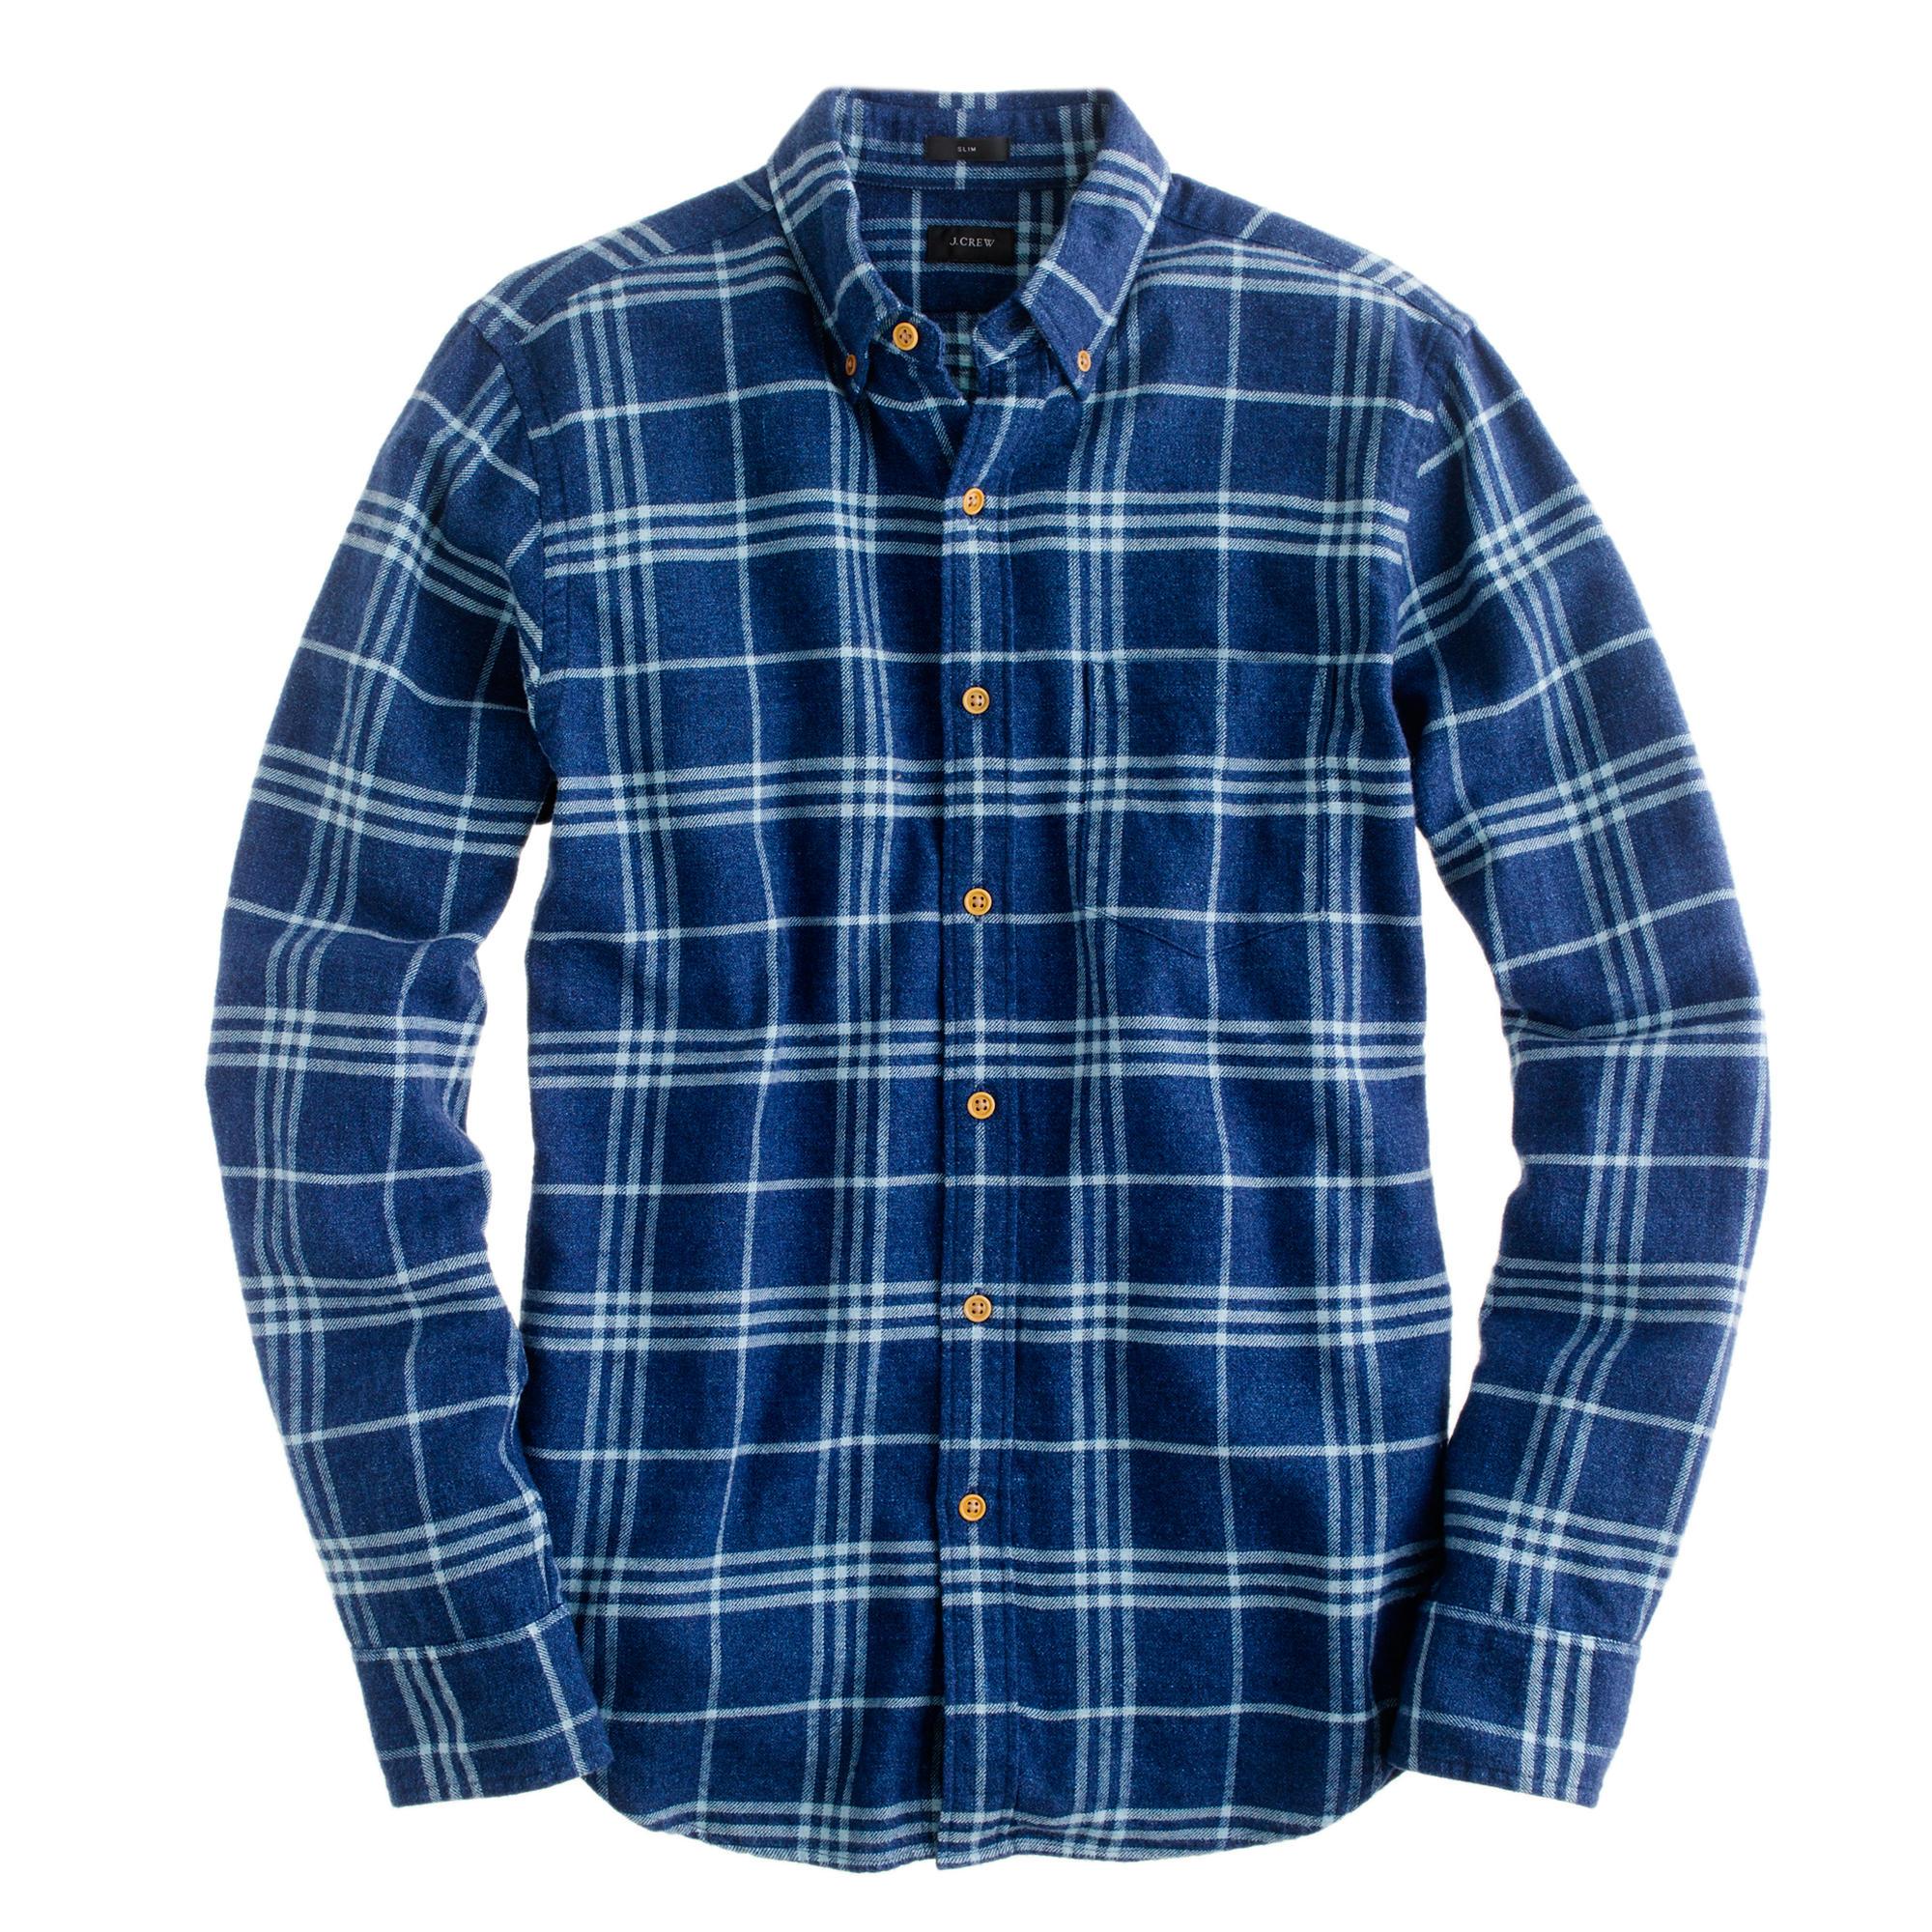 Slim brushed twill shirt in indigo check j crew for Brushed cotton twill shirt